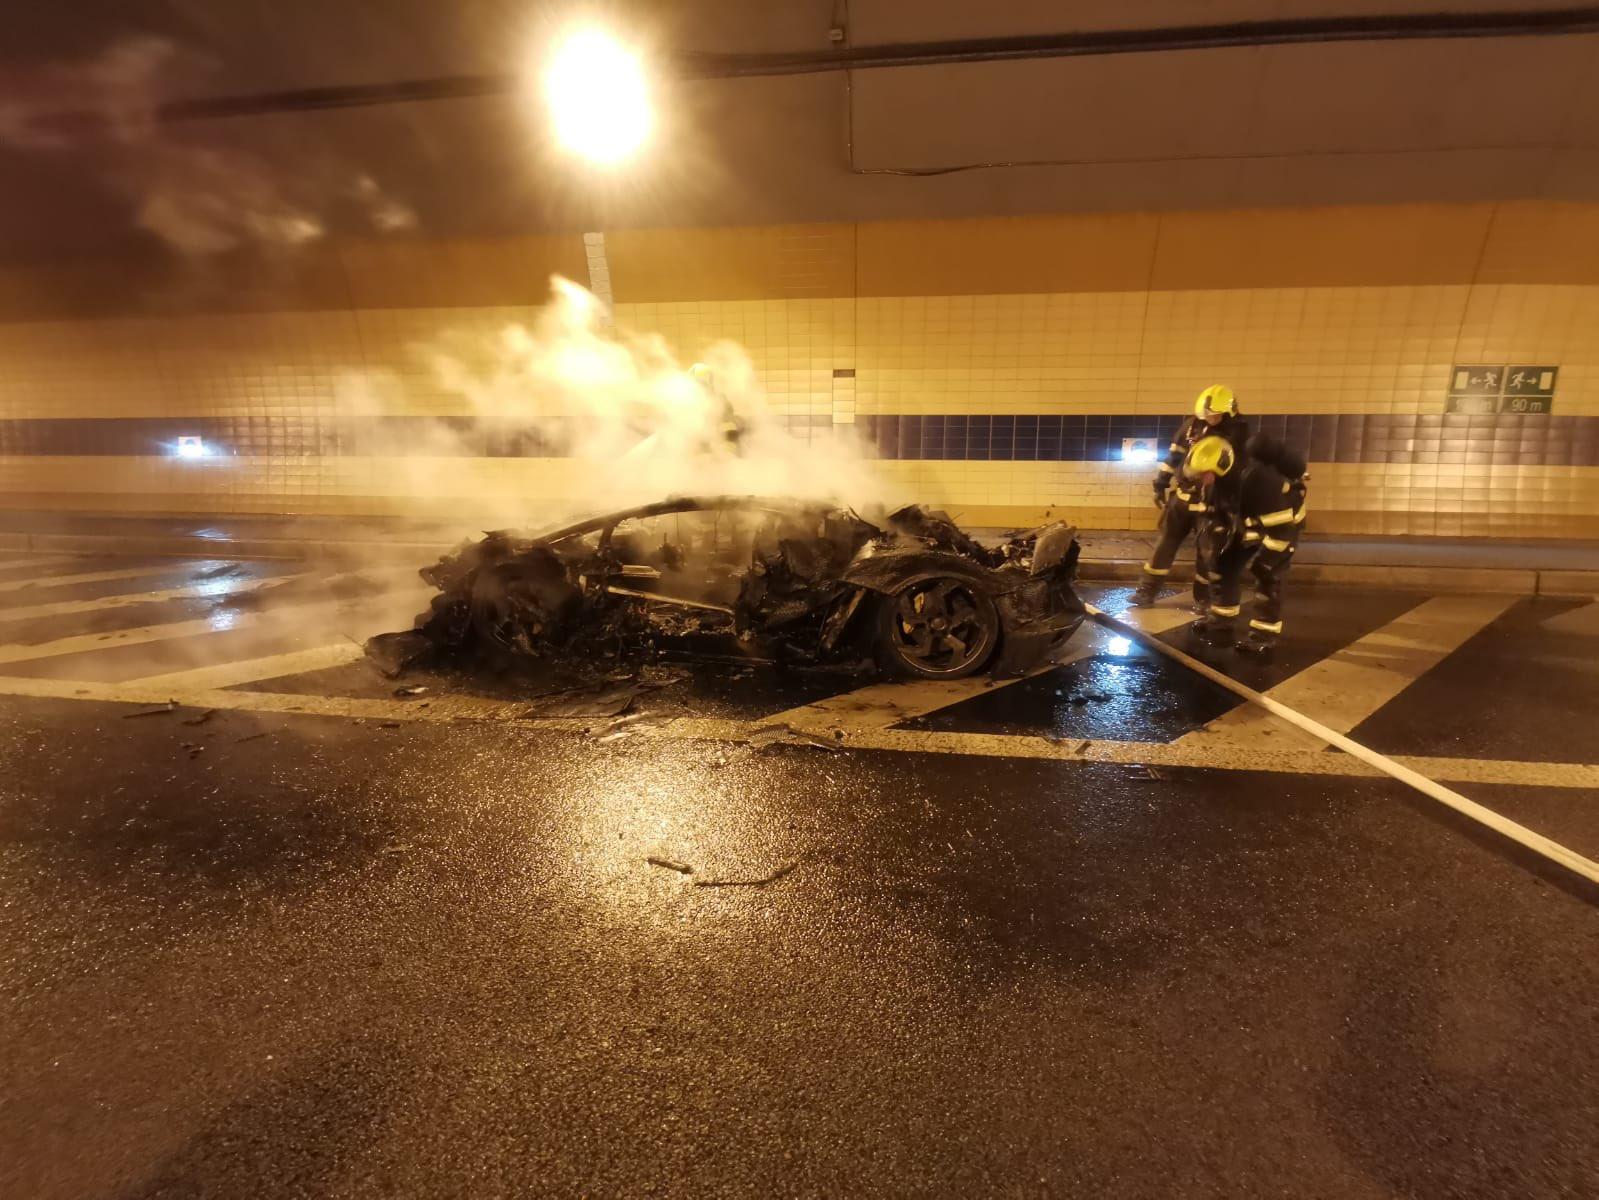 Lamborghini-Aventador-Carbonado-burned-6